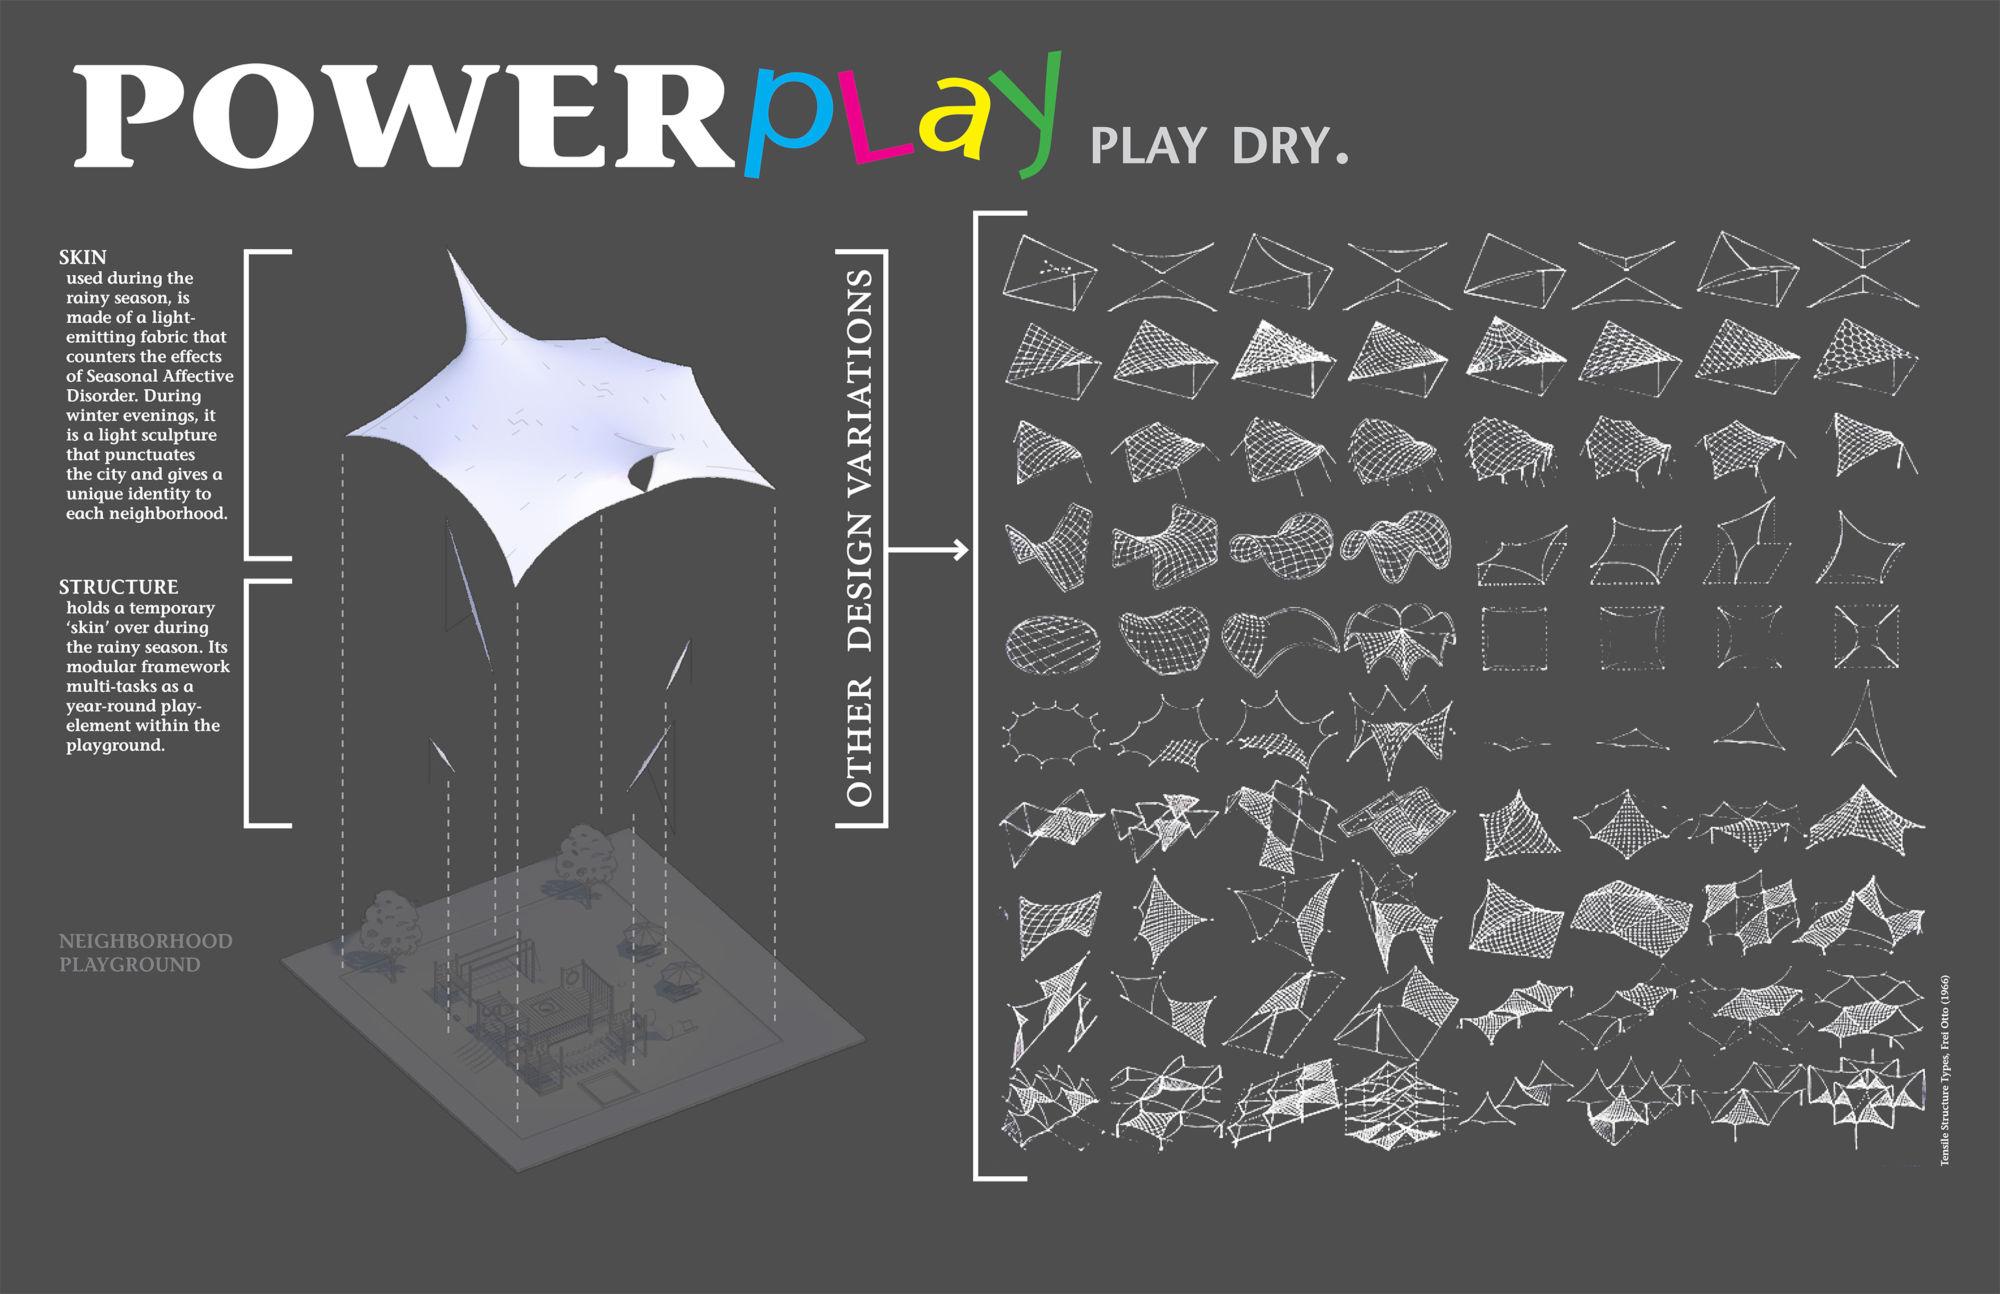 B4 - VPSN_Umbrellas_Competition_d1 - 11-1.jpg